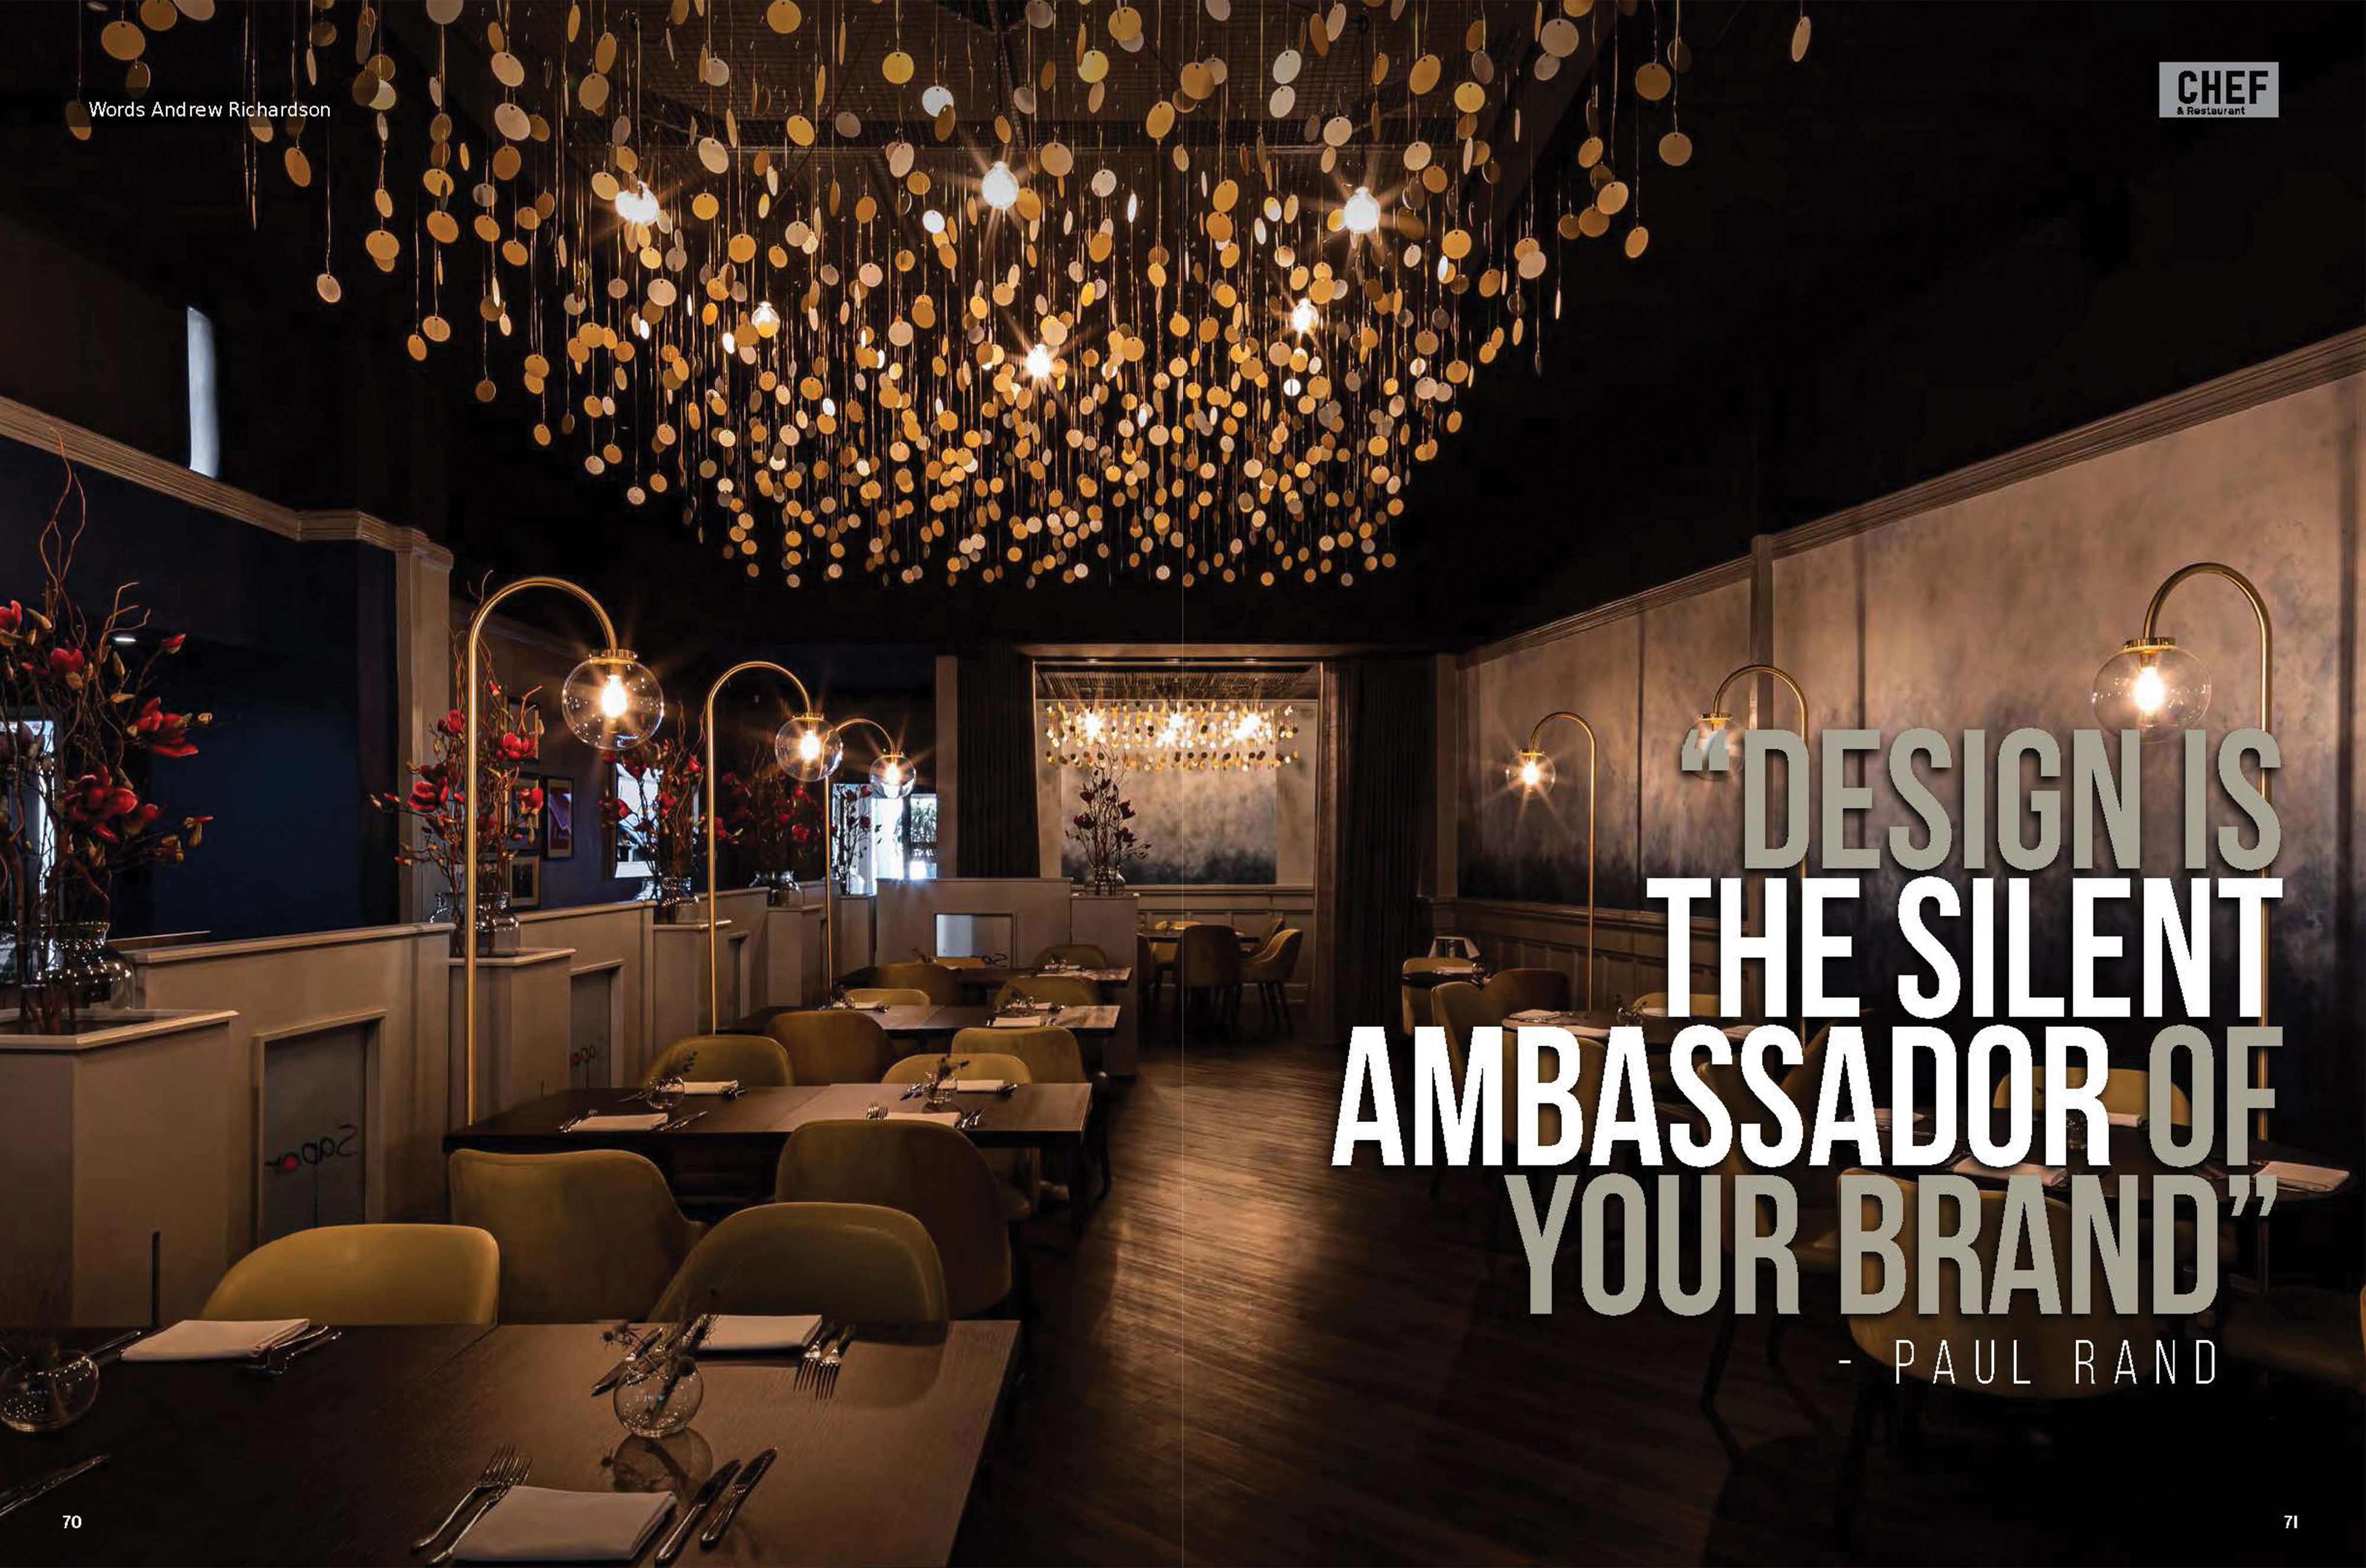 Tony Matters restaurant interior design